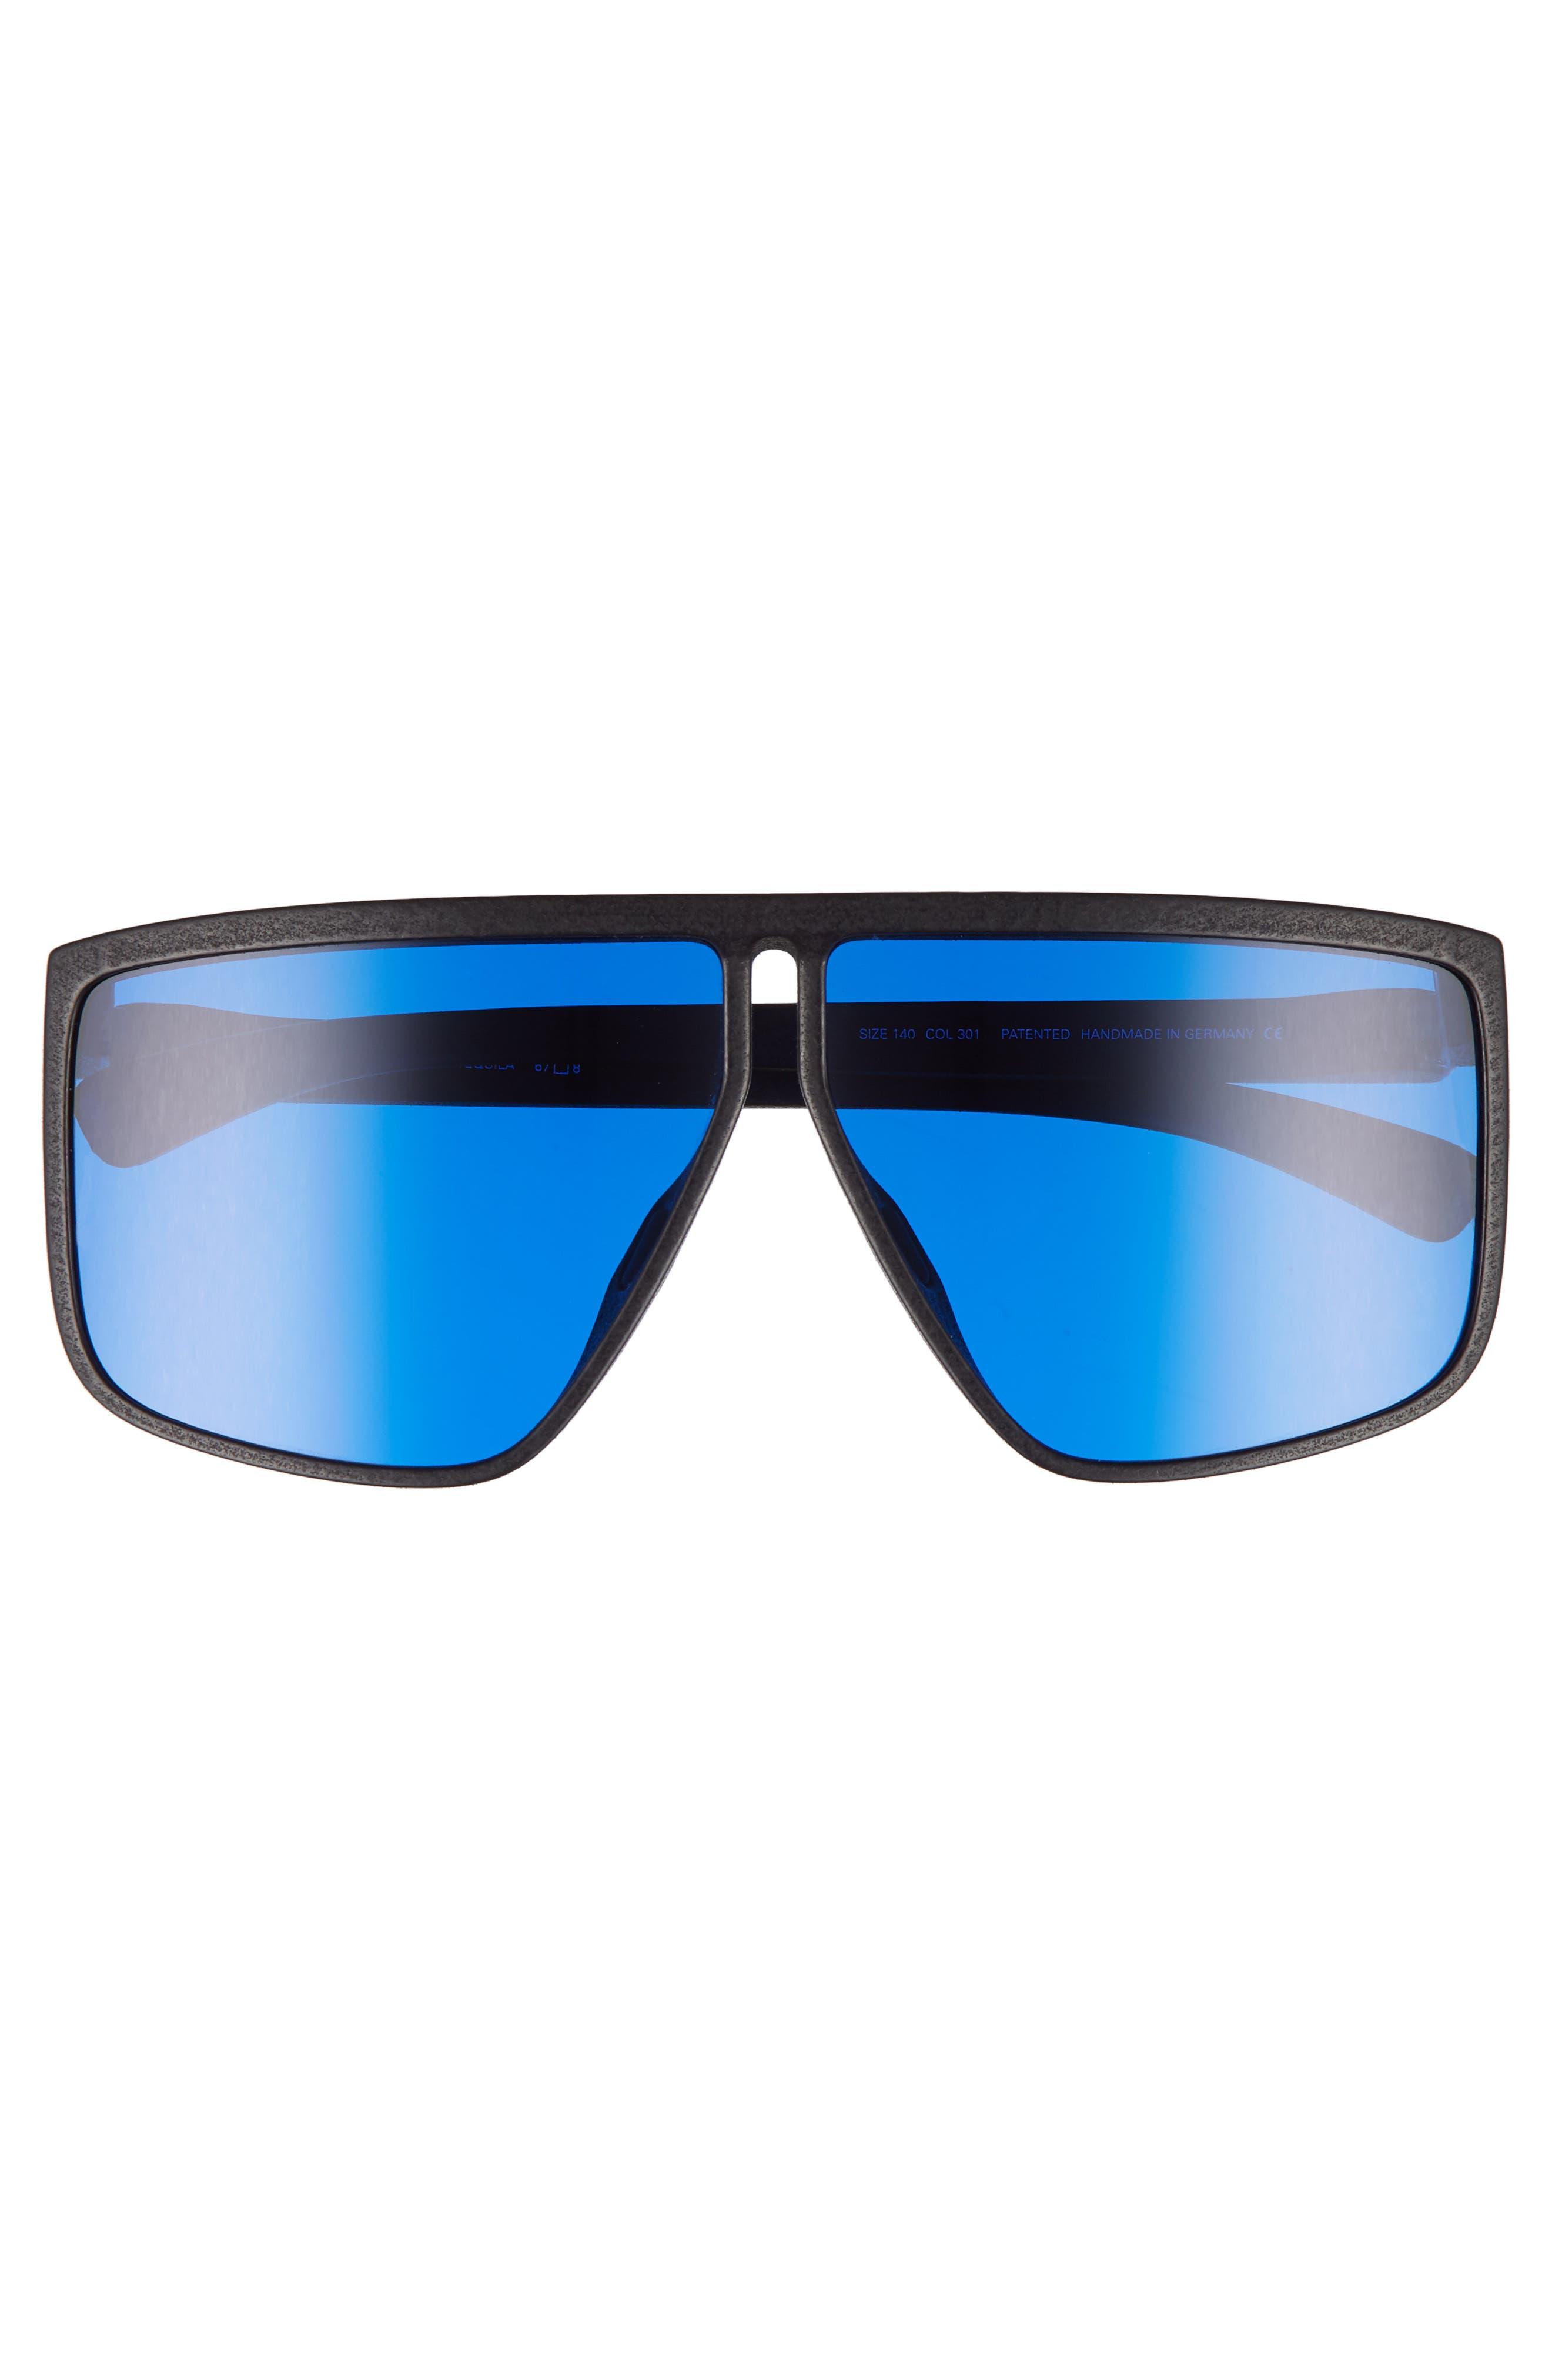 Tequila 67mm Sunglasses,                             Alternate thumbnail 2, color,                             001